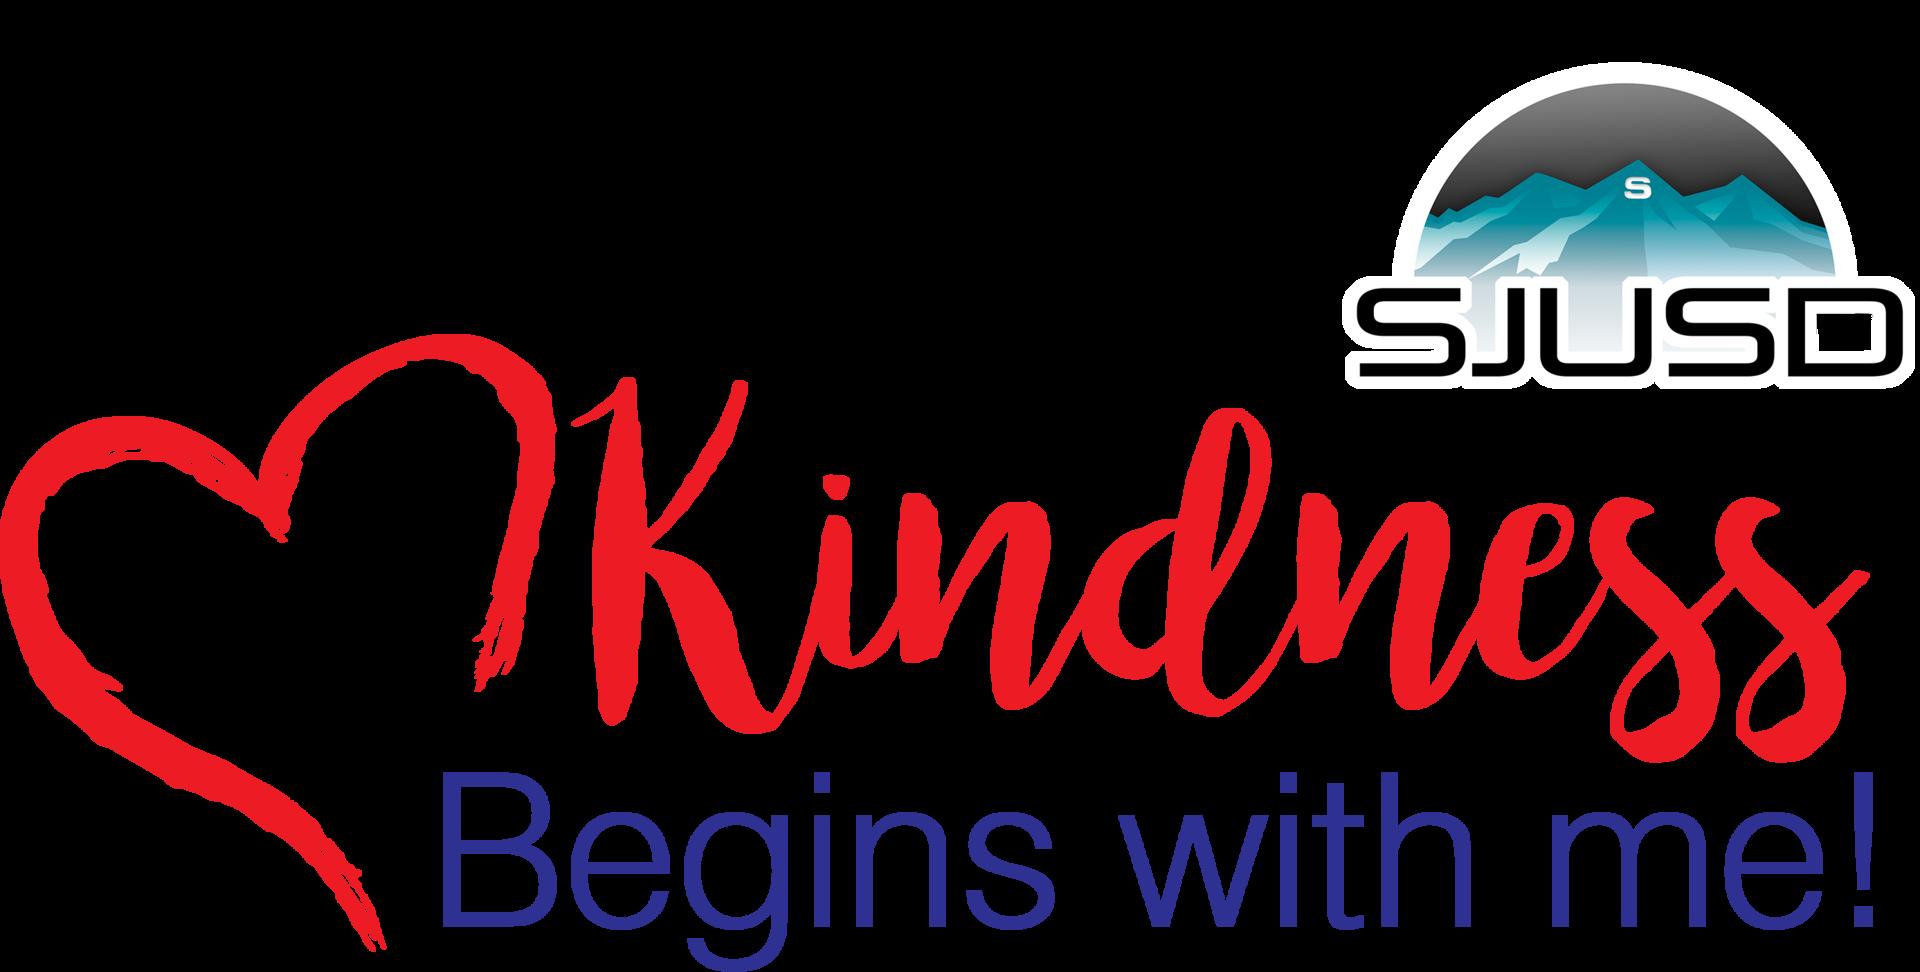 SJUSD Kindness Logo